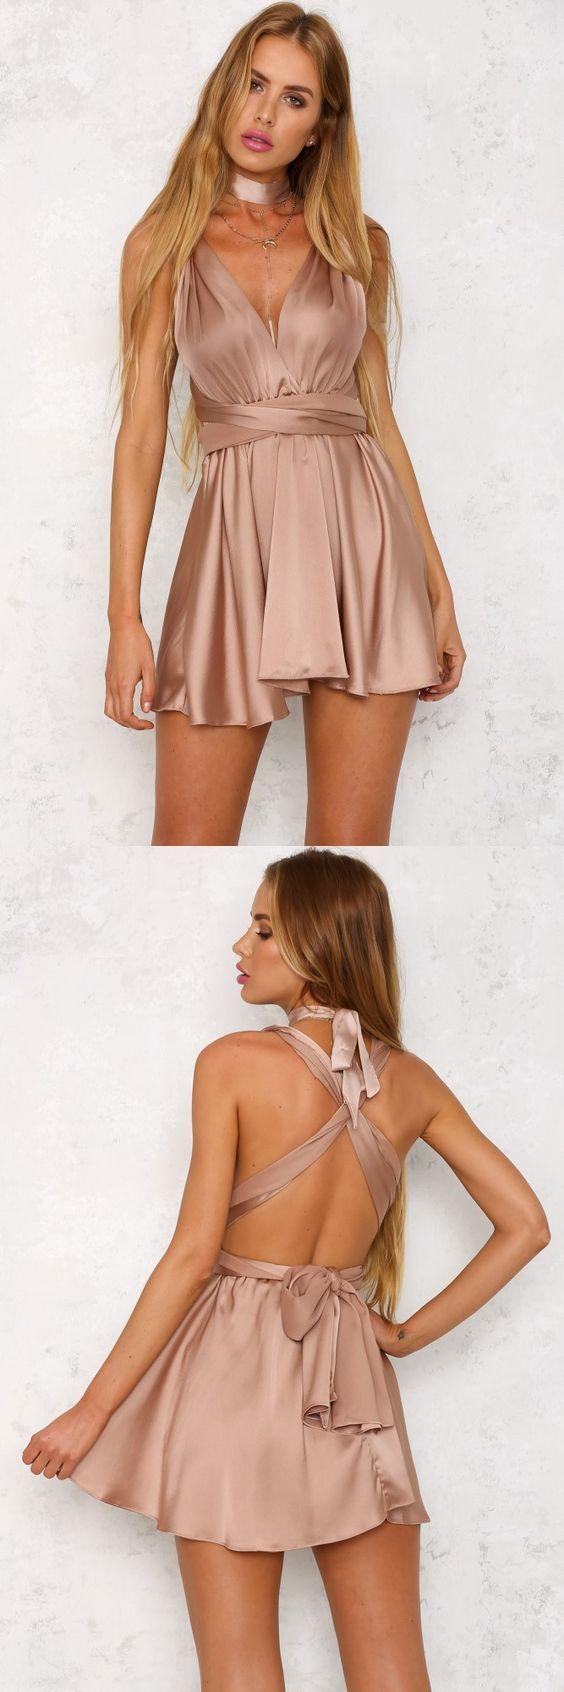 Copy of A-Line Deep V-Neck Short Blush Convertible Homecoming Dress